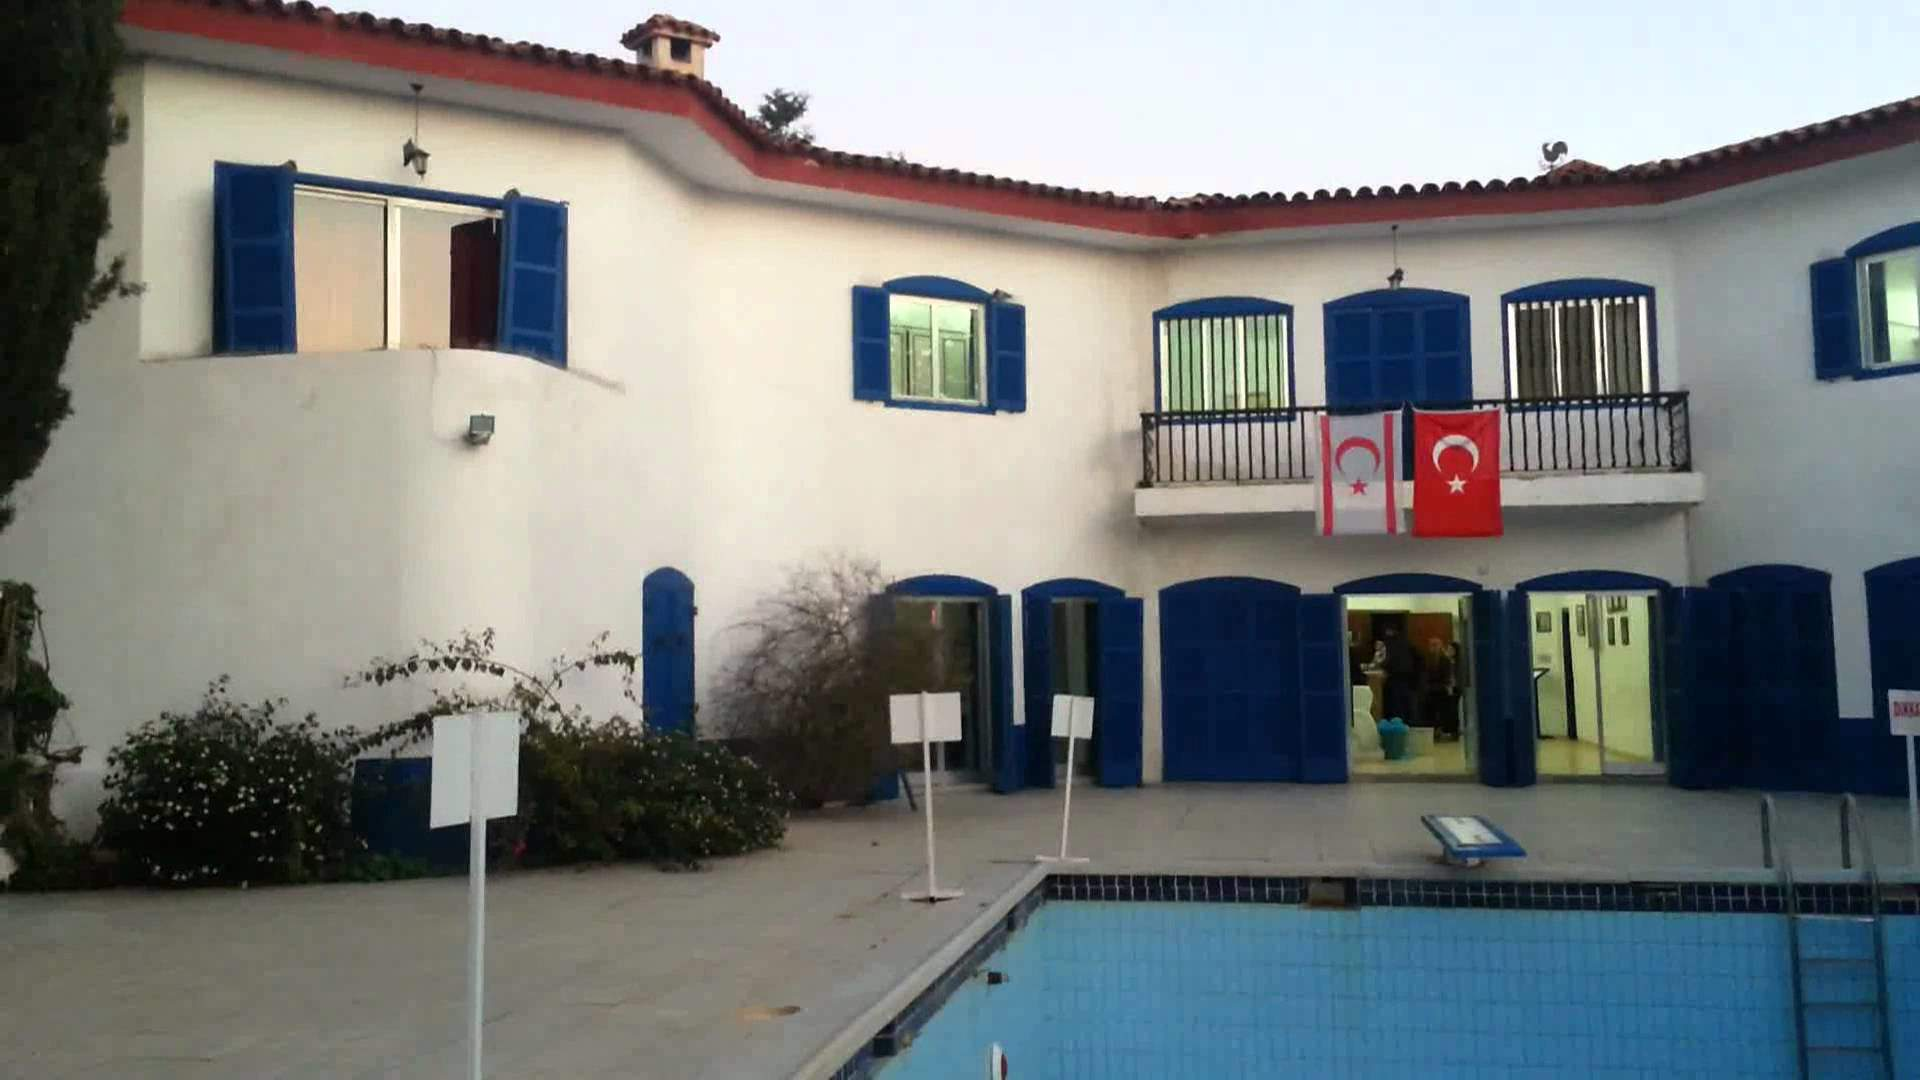 mavi köşk Kıbrıs